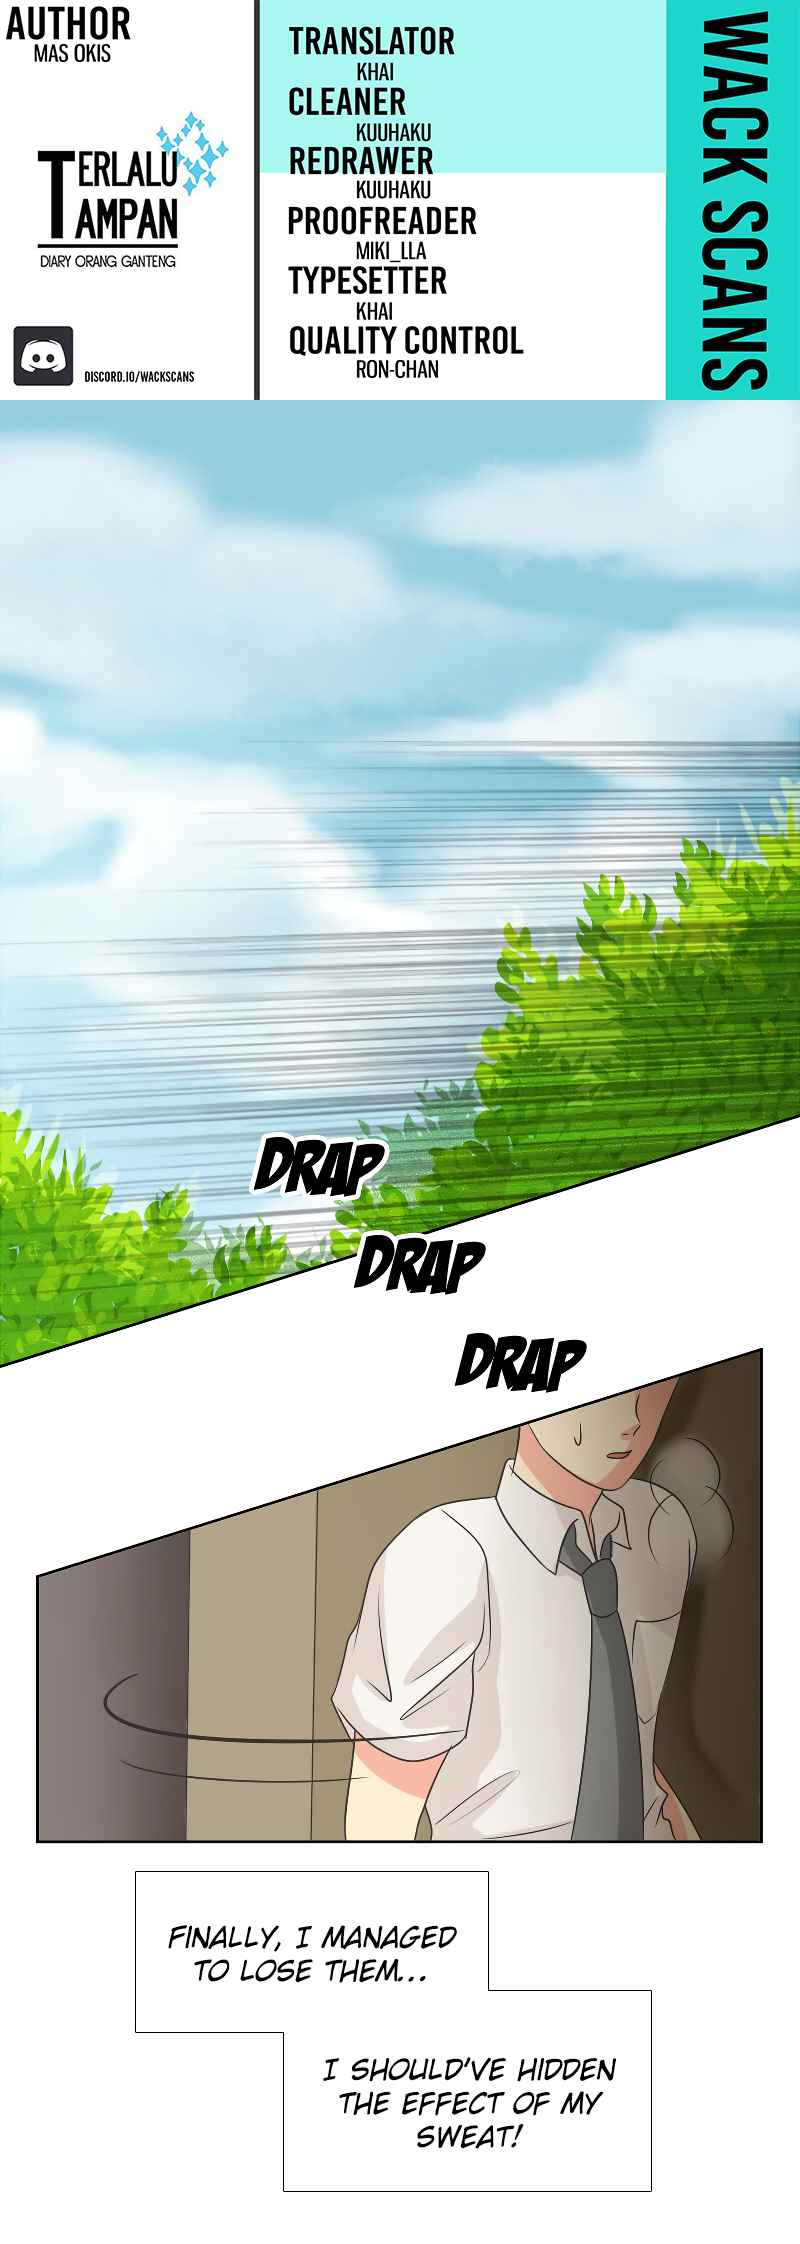 https://img2.nineanime.com/comics/pic2/29/18781/723474/7c8fcc11b9e0221bcac8a259c060f9be.jpg Page 1